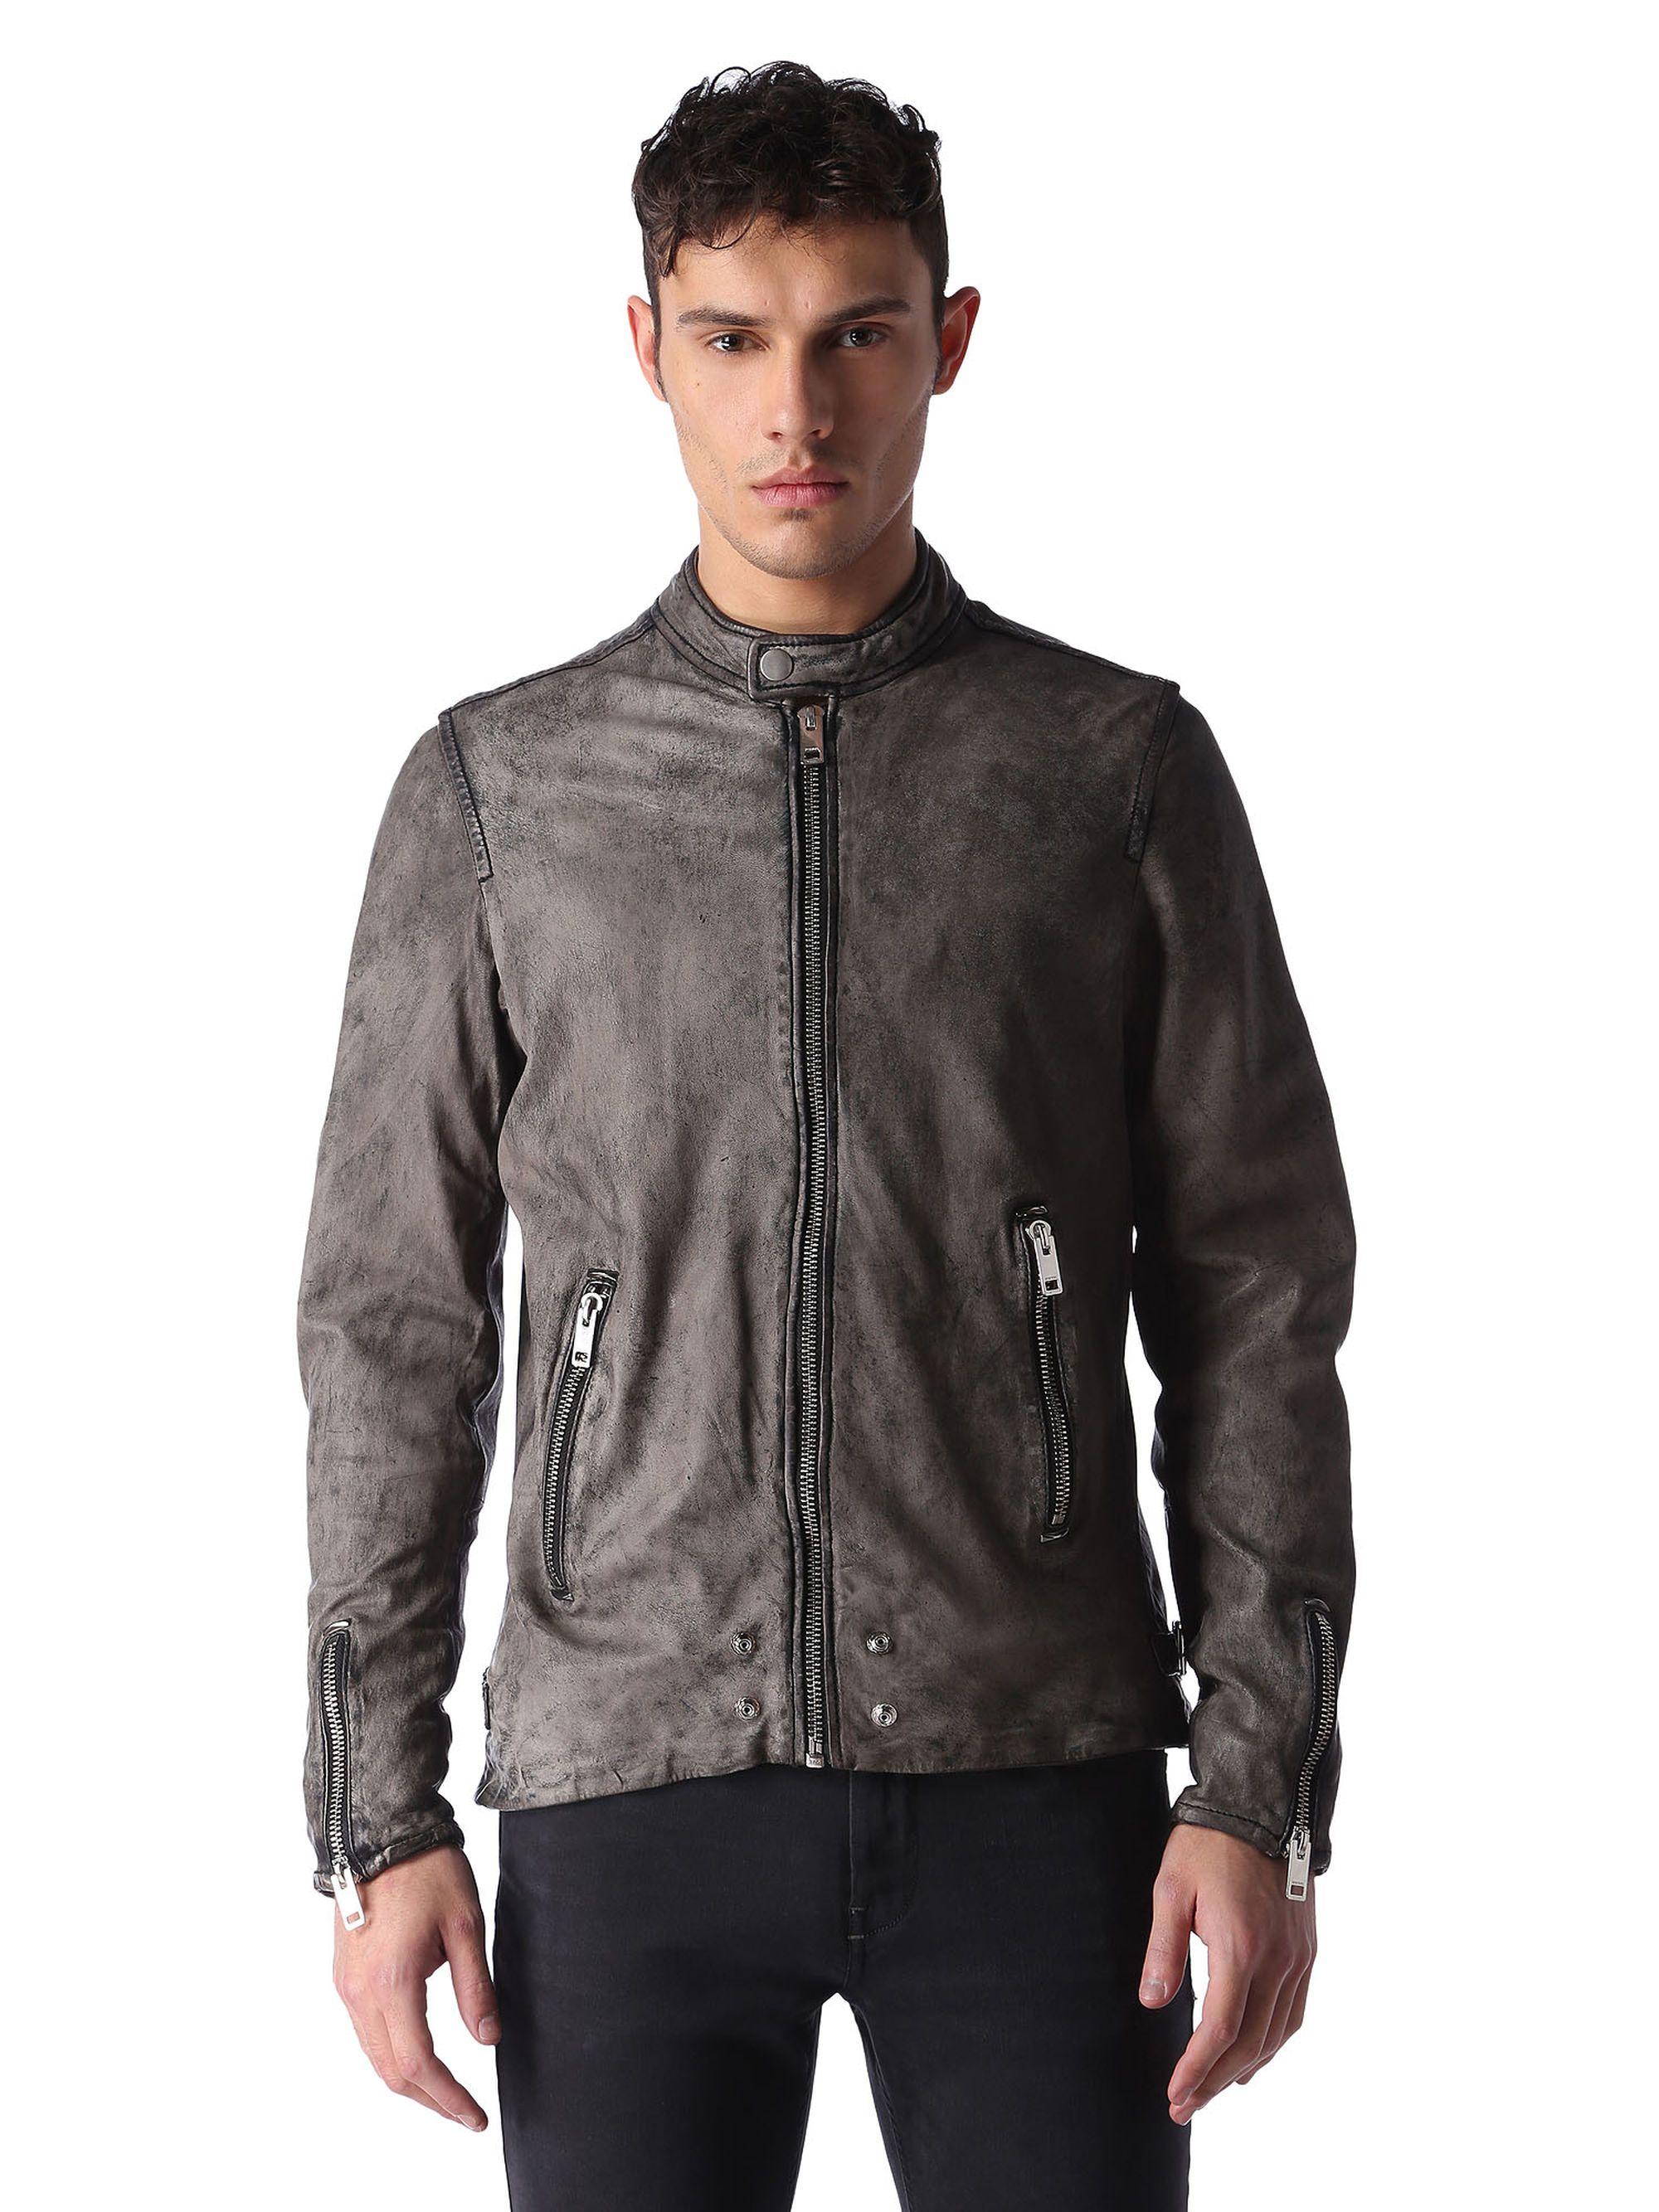 Clothing · L-EDGER   Diesel International Site